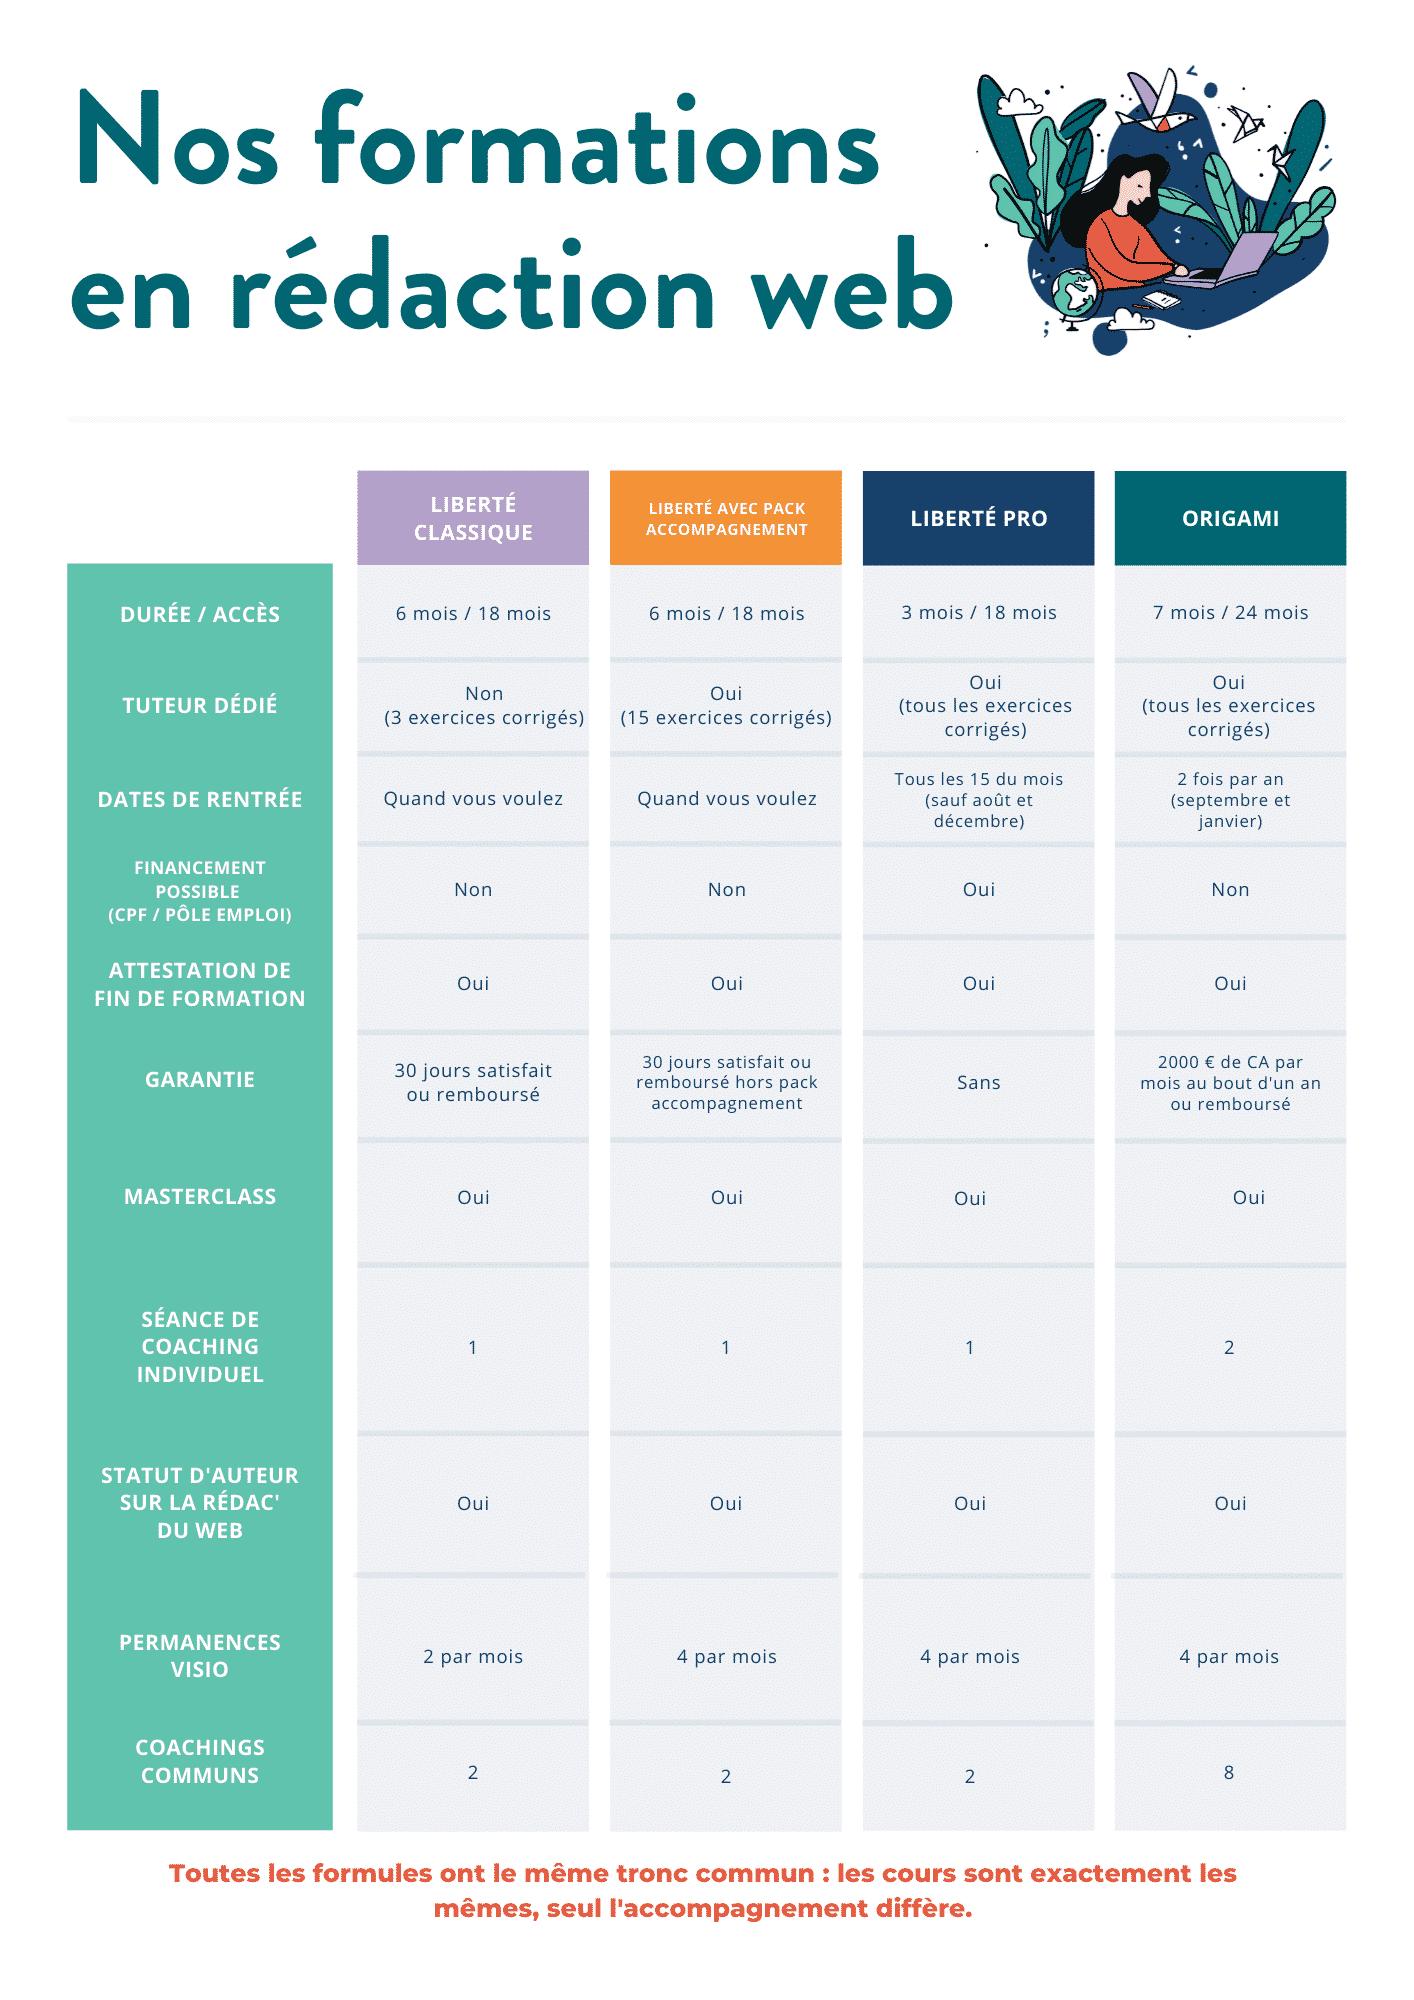 Tableau comparatif des formations FRW